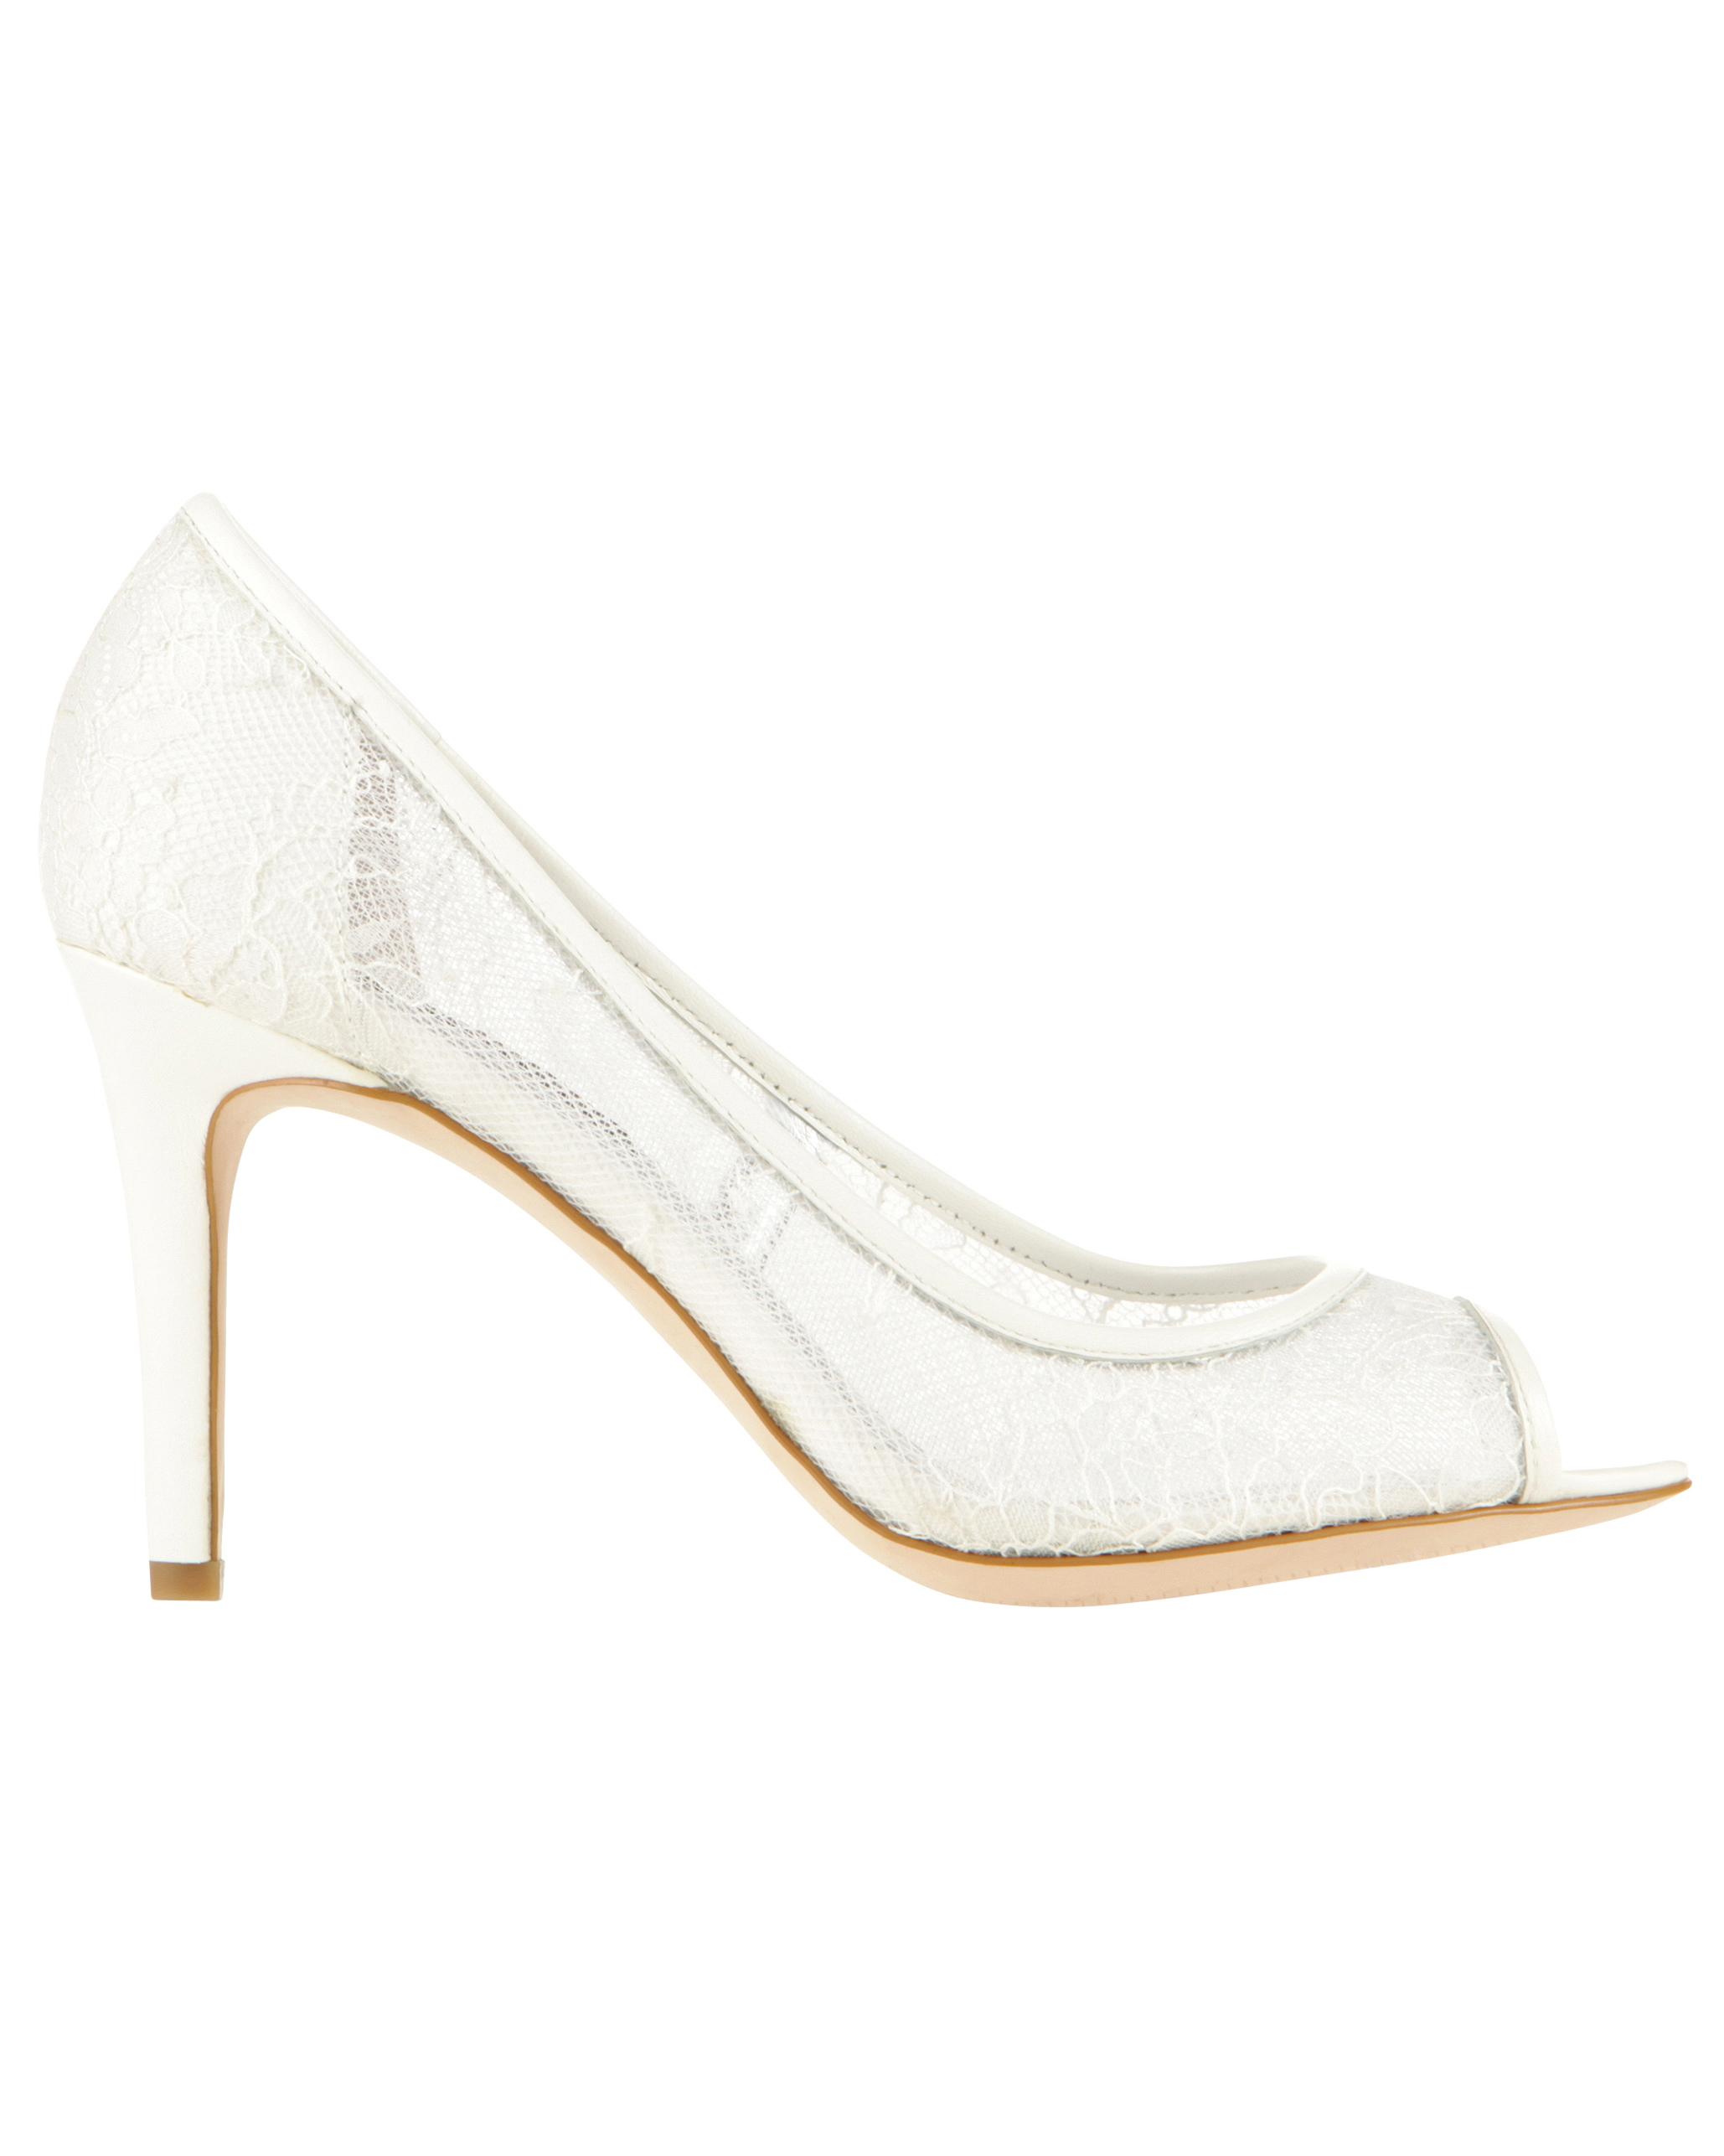 ann-taylor-shoes-msw-fall13.jpg